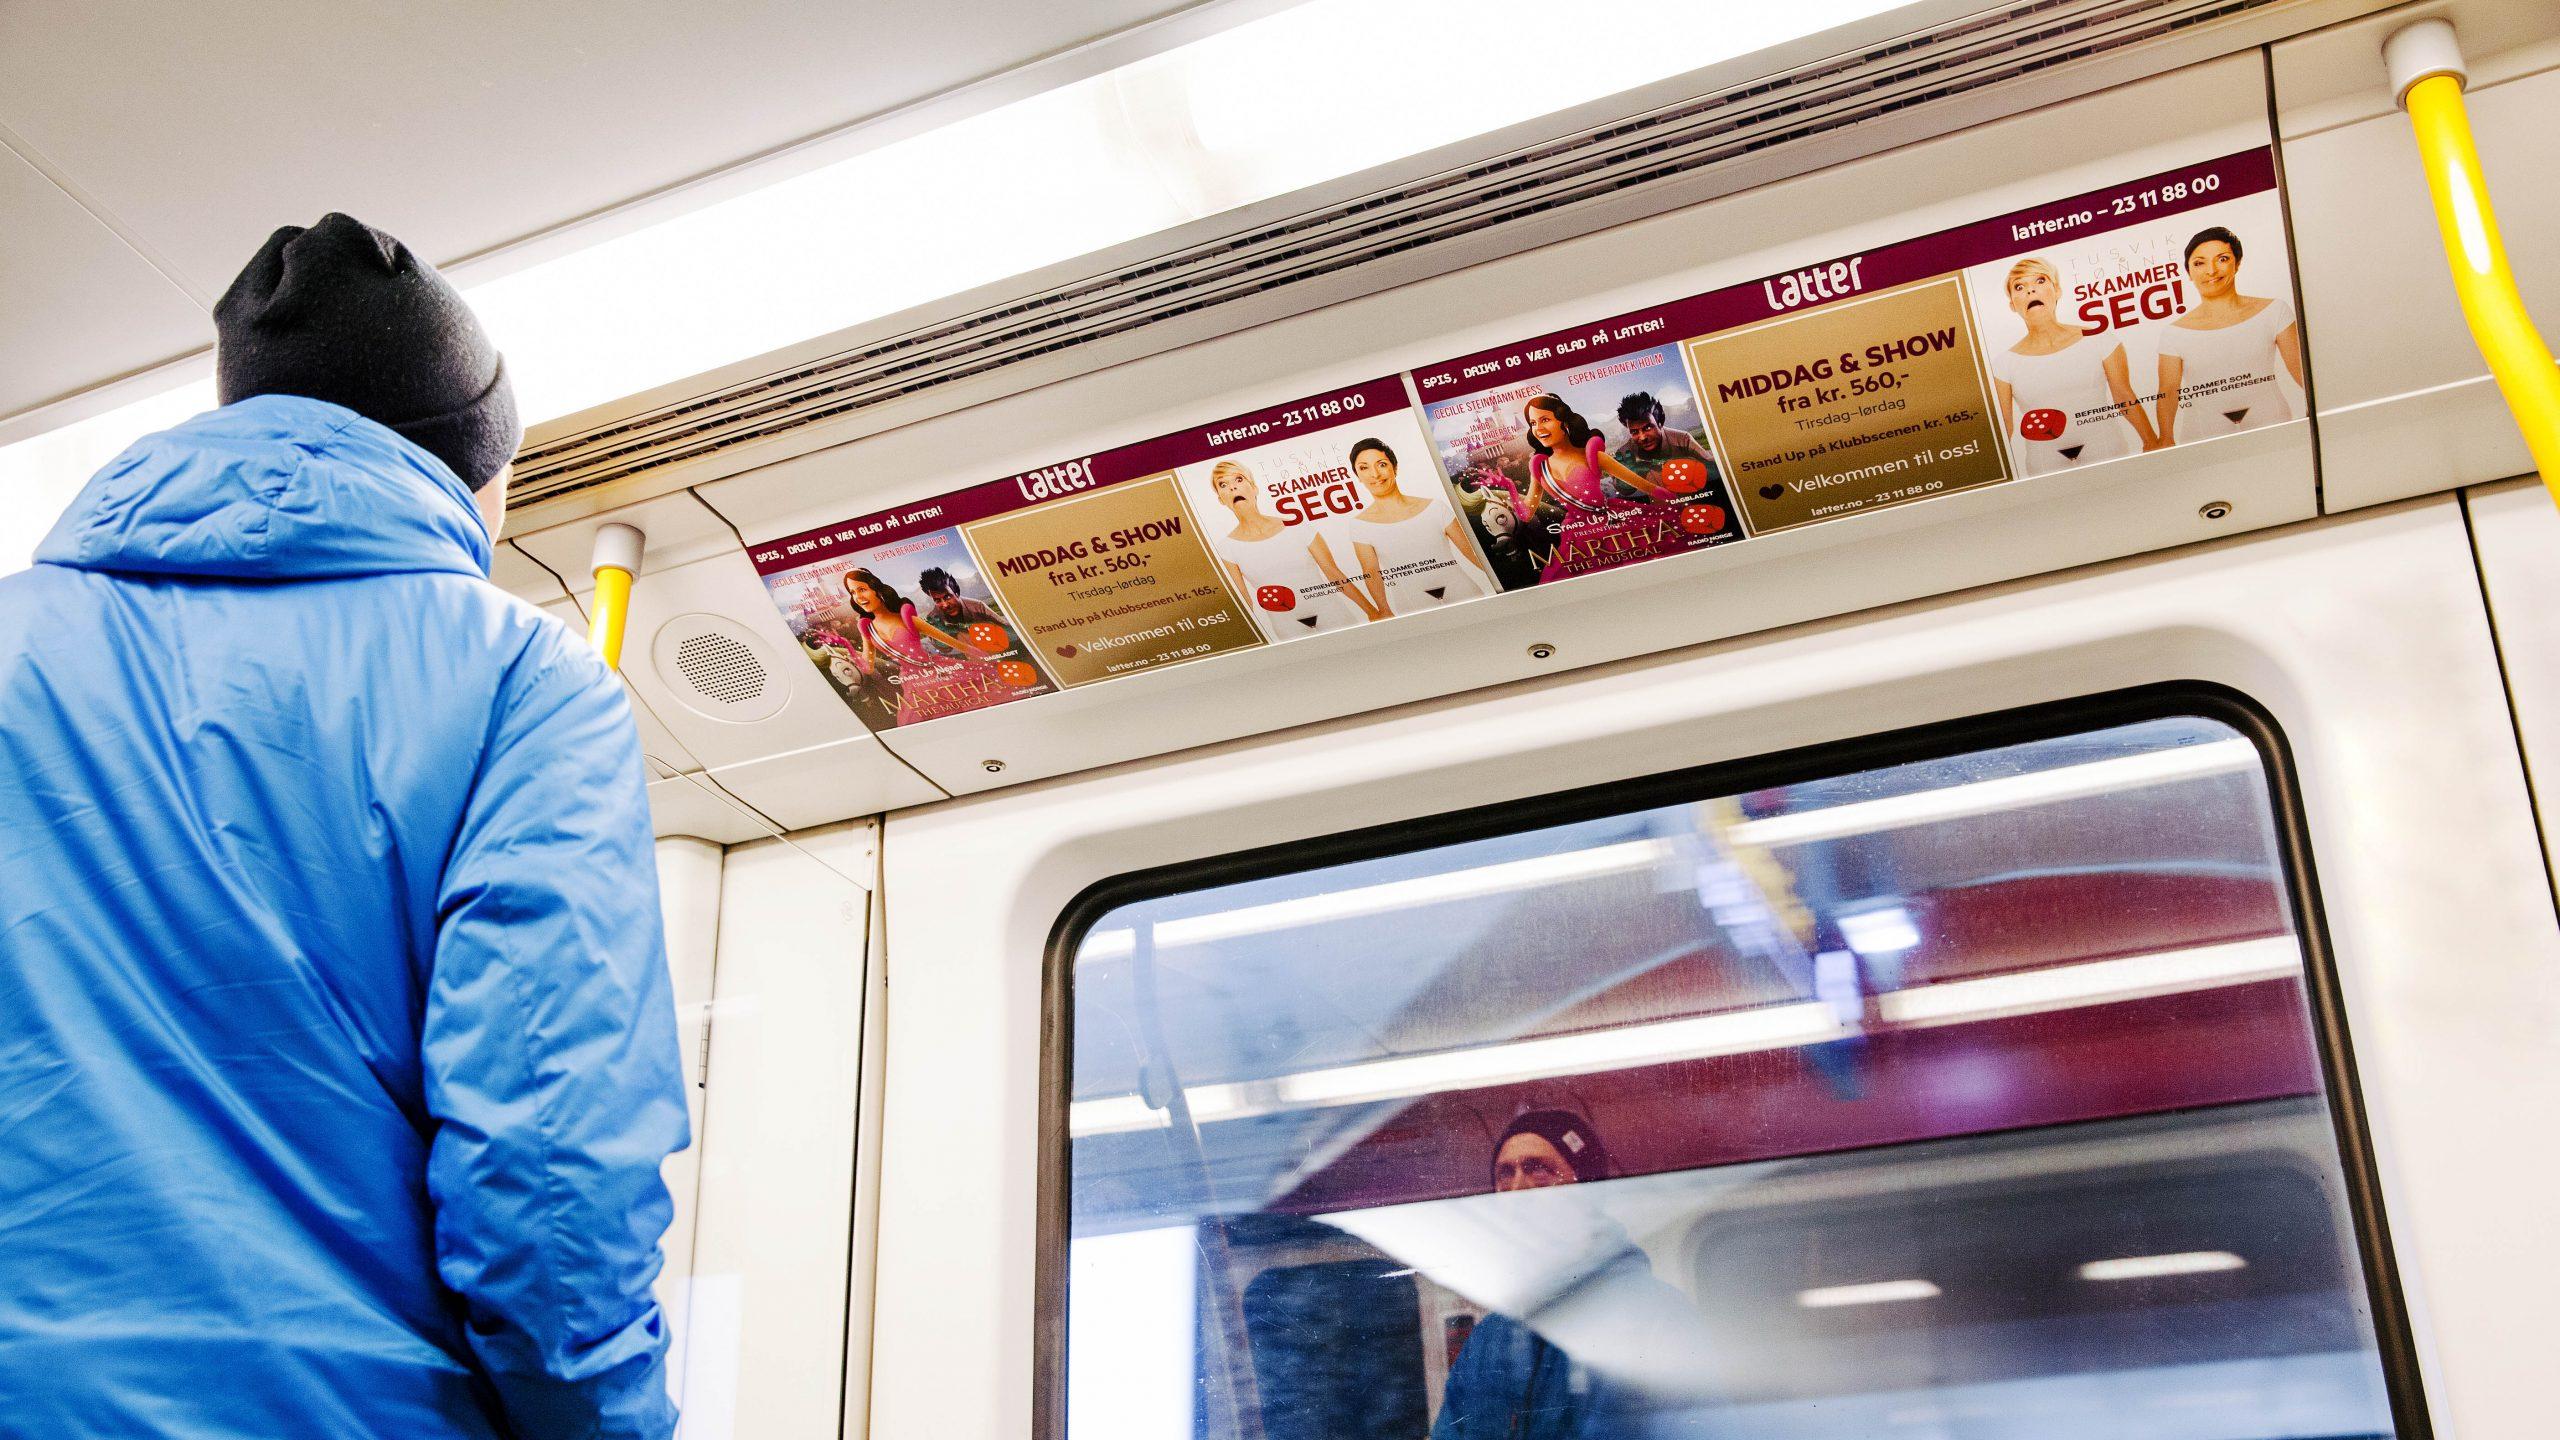 cc-no-takbuer-metro-2stk.jpg